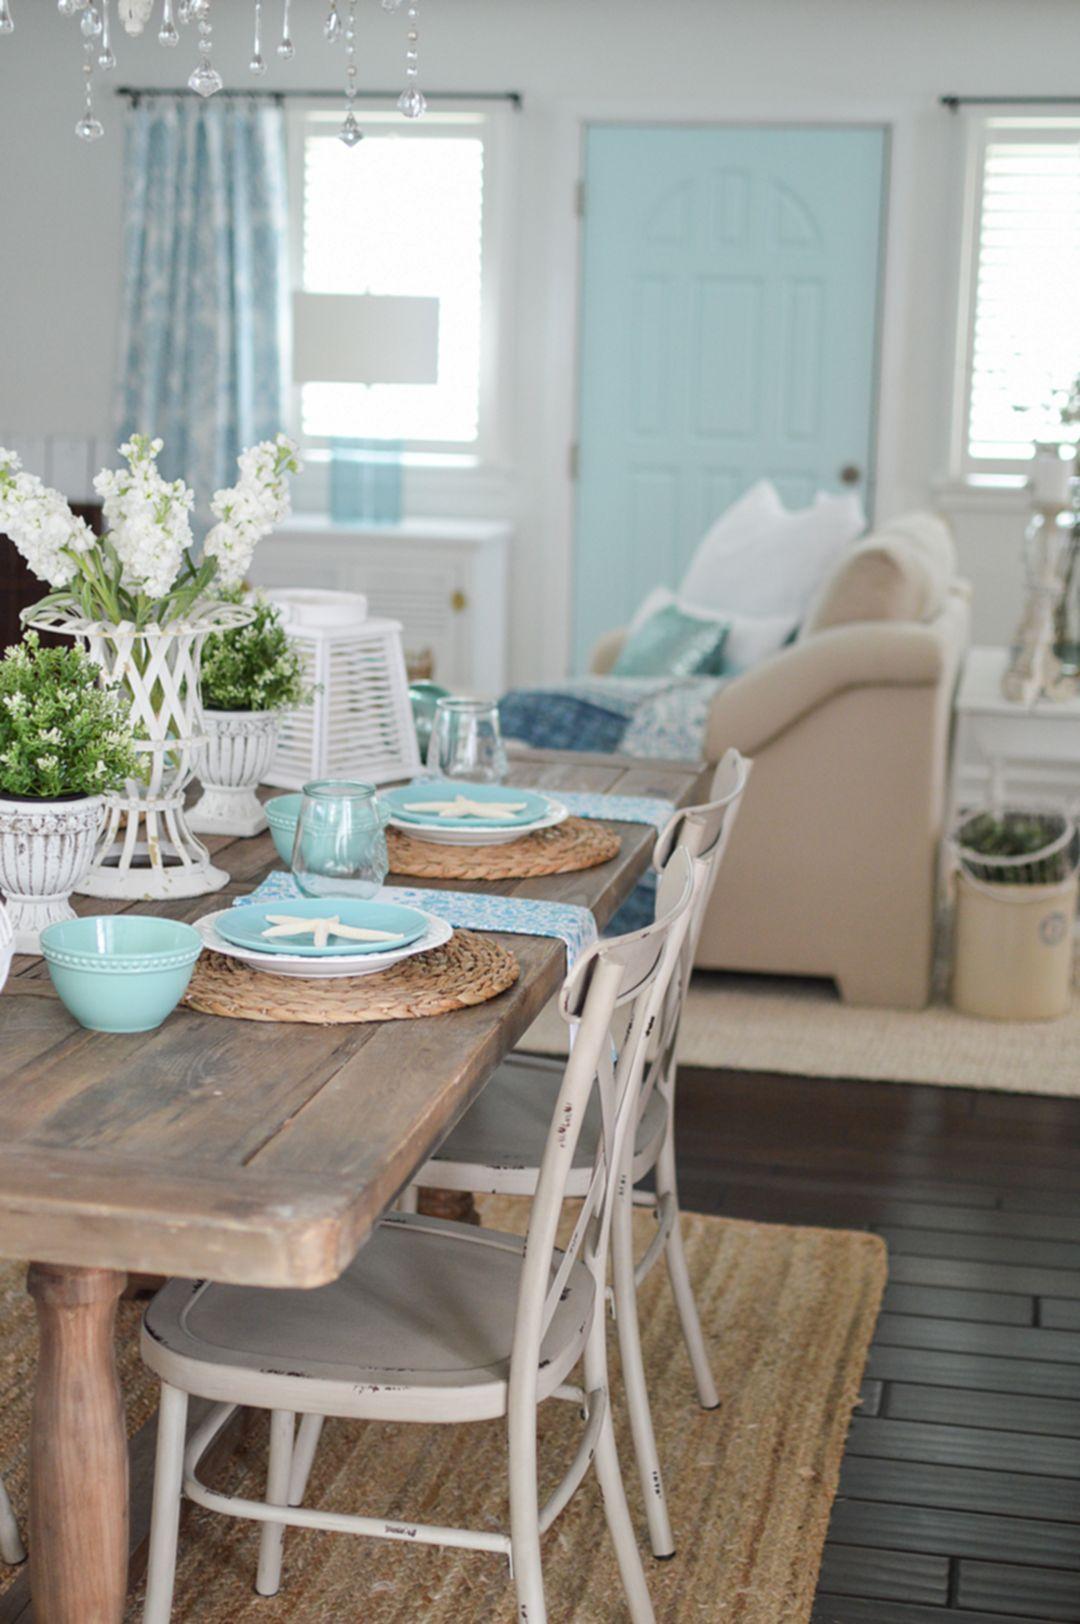 65+ Amazing Farmhouse Kitchen Design And Decorations Ideas ...